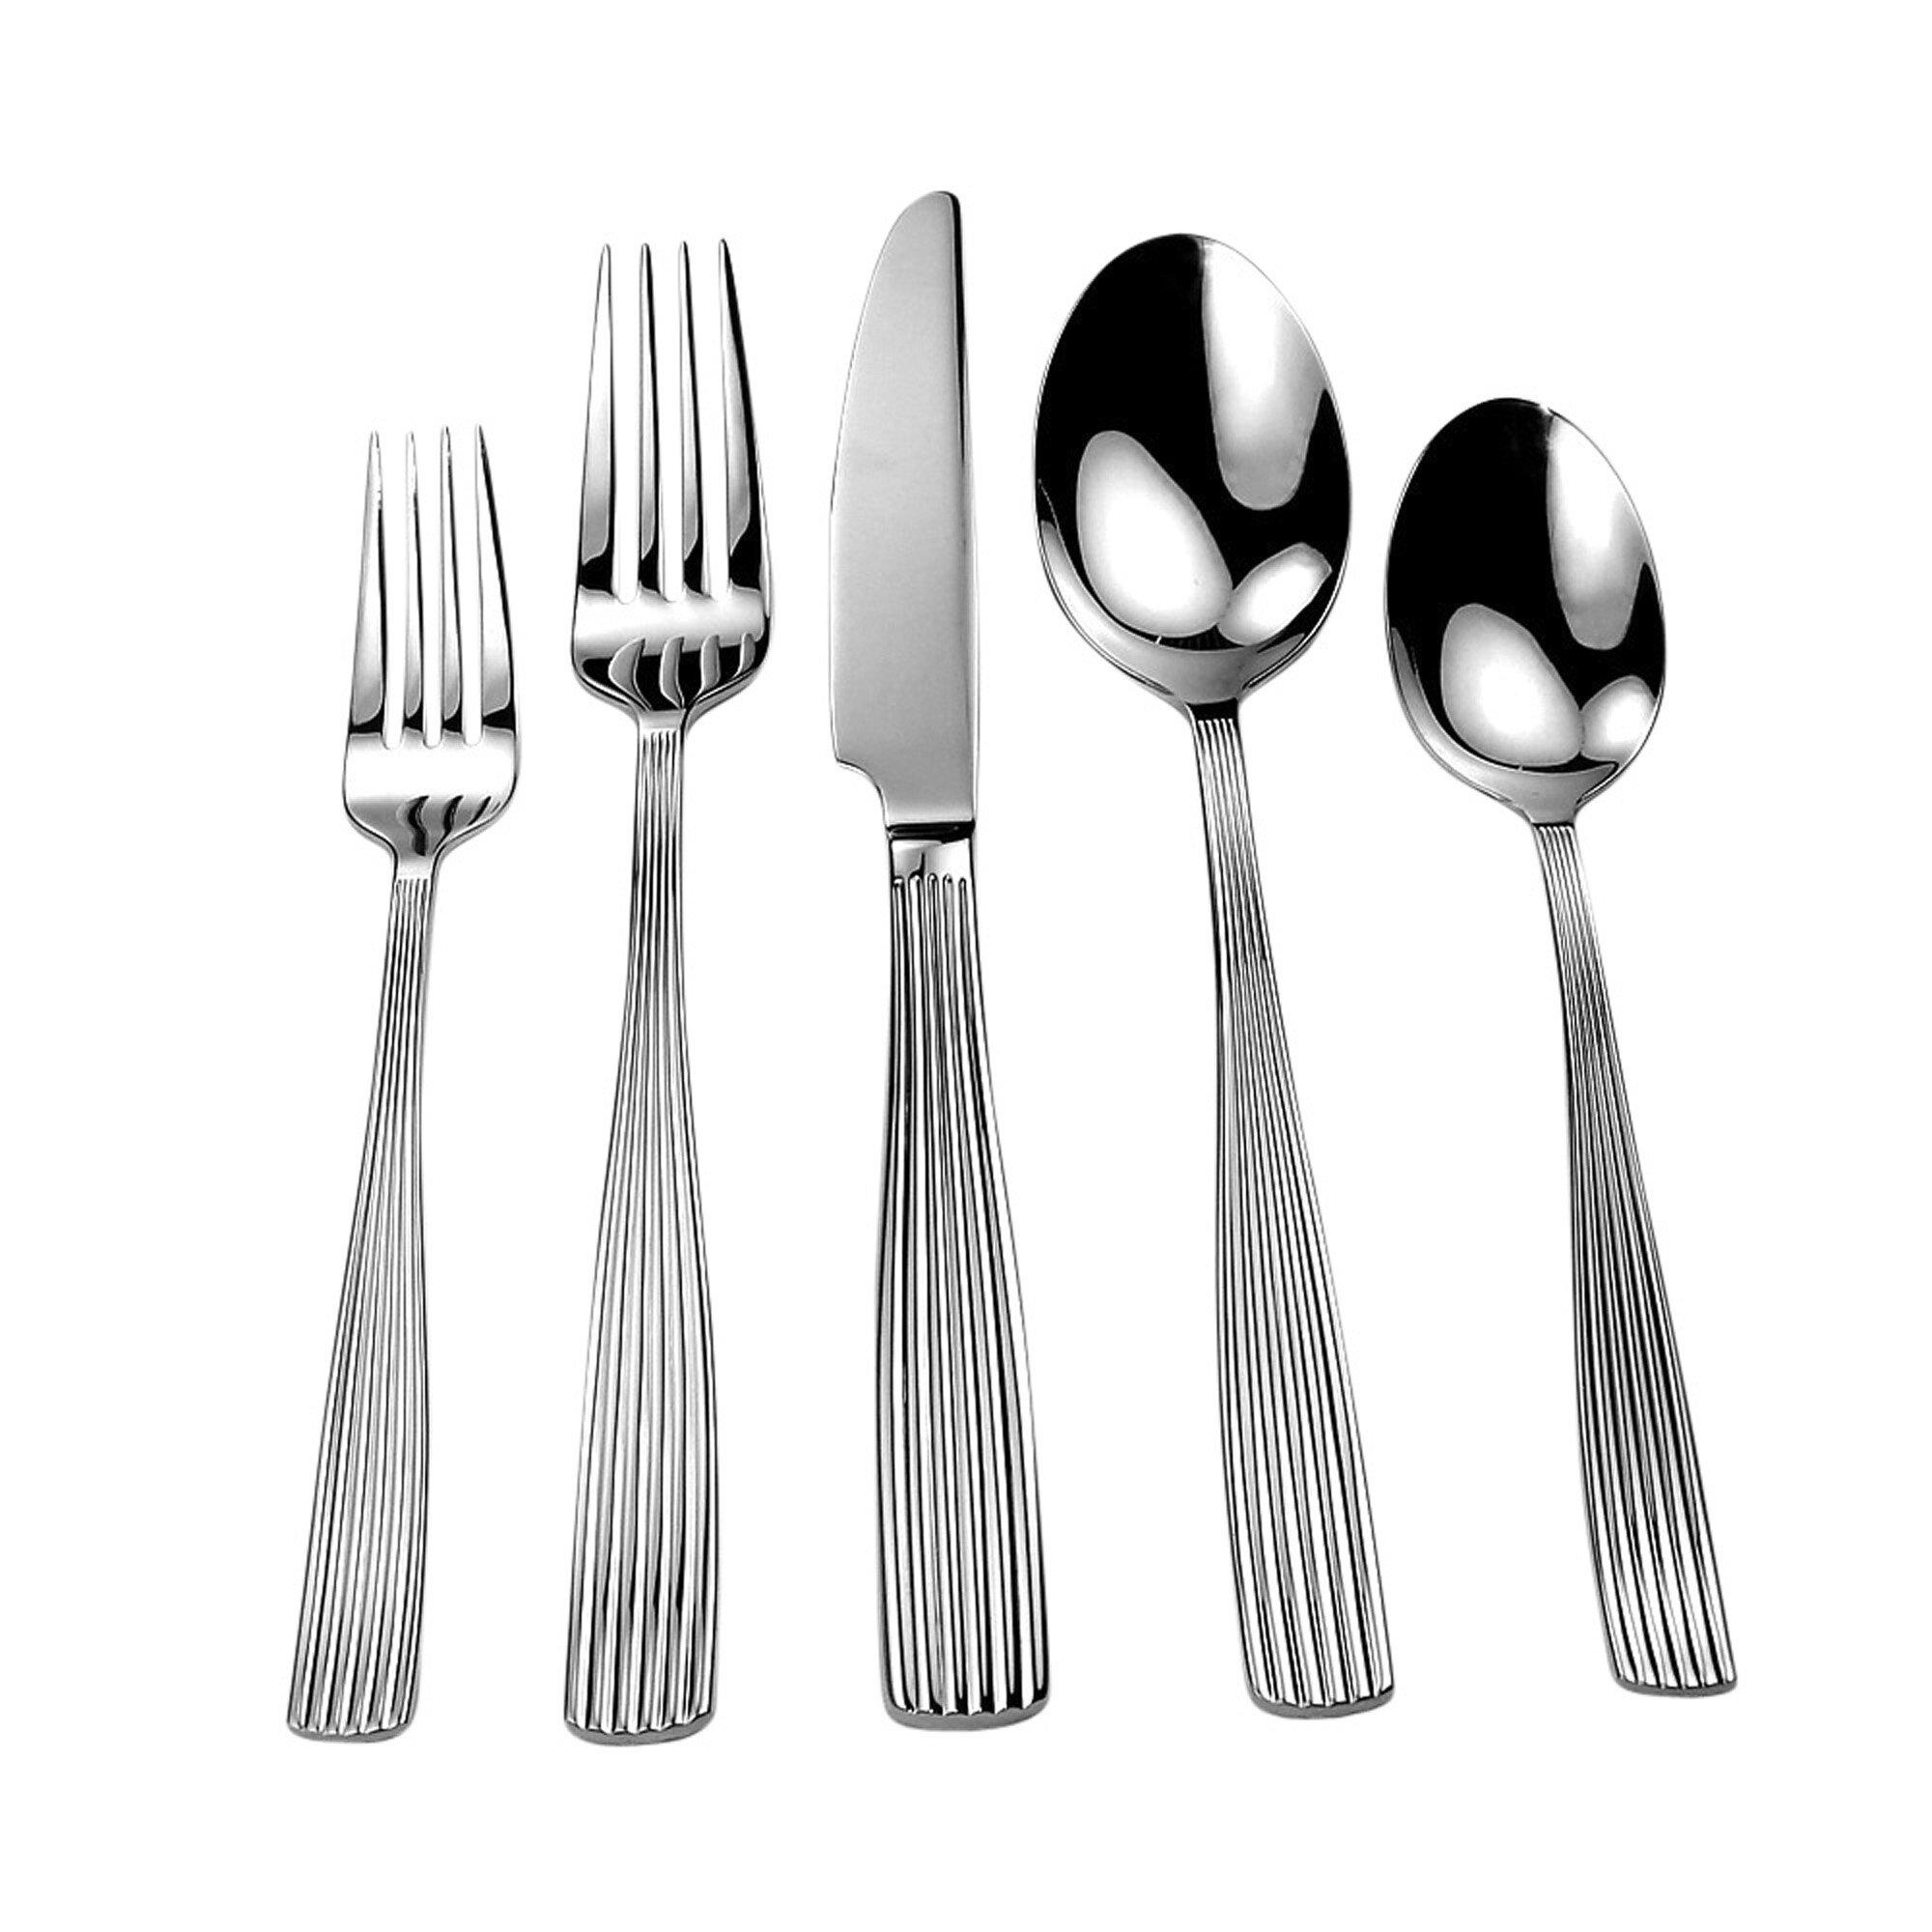 David shaw silverware splendide melrose 20 piece flatware set reviews wayfair - Splendide flatware ...